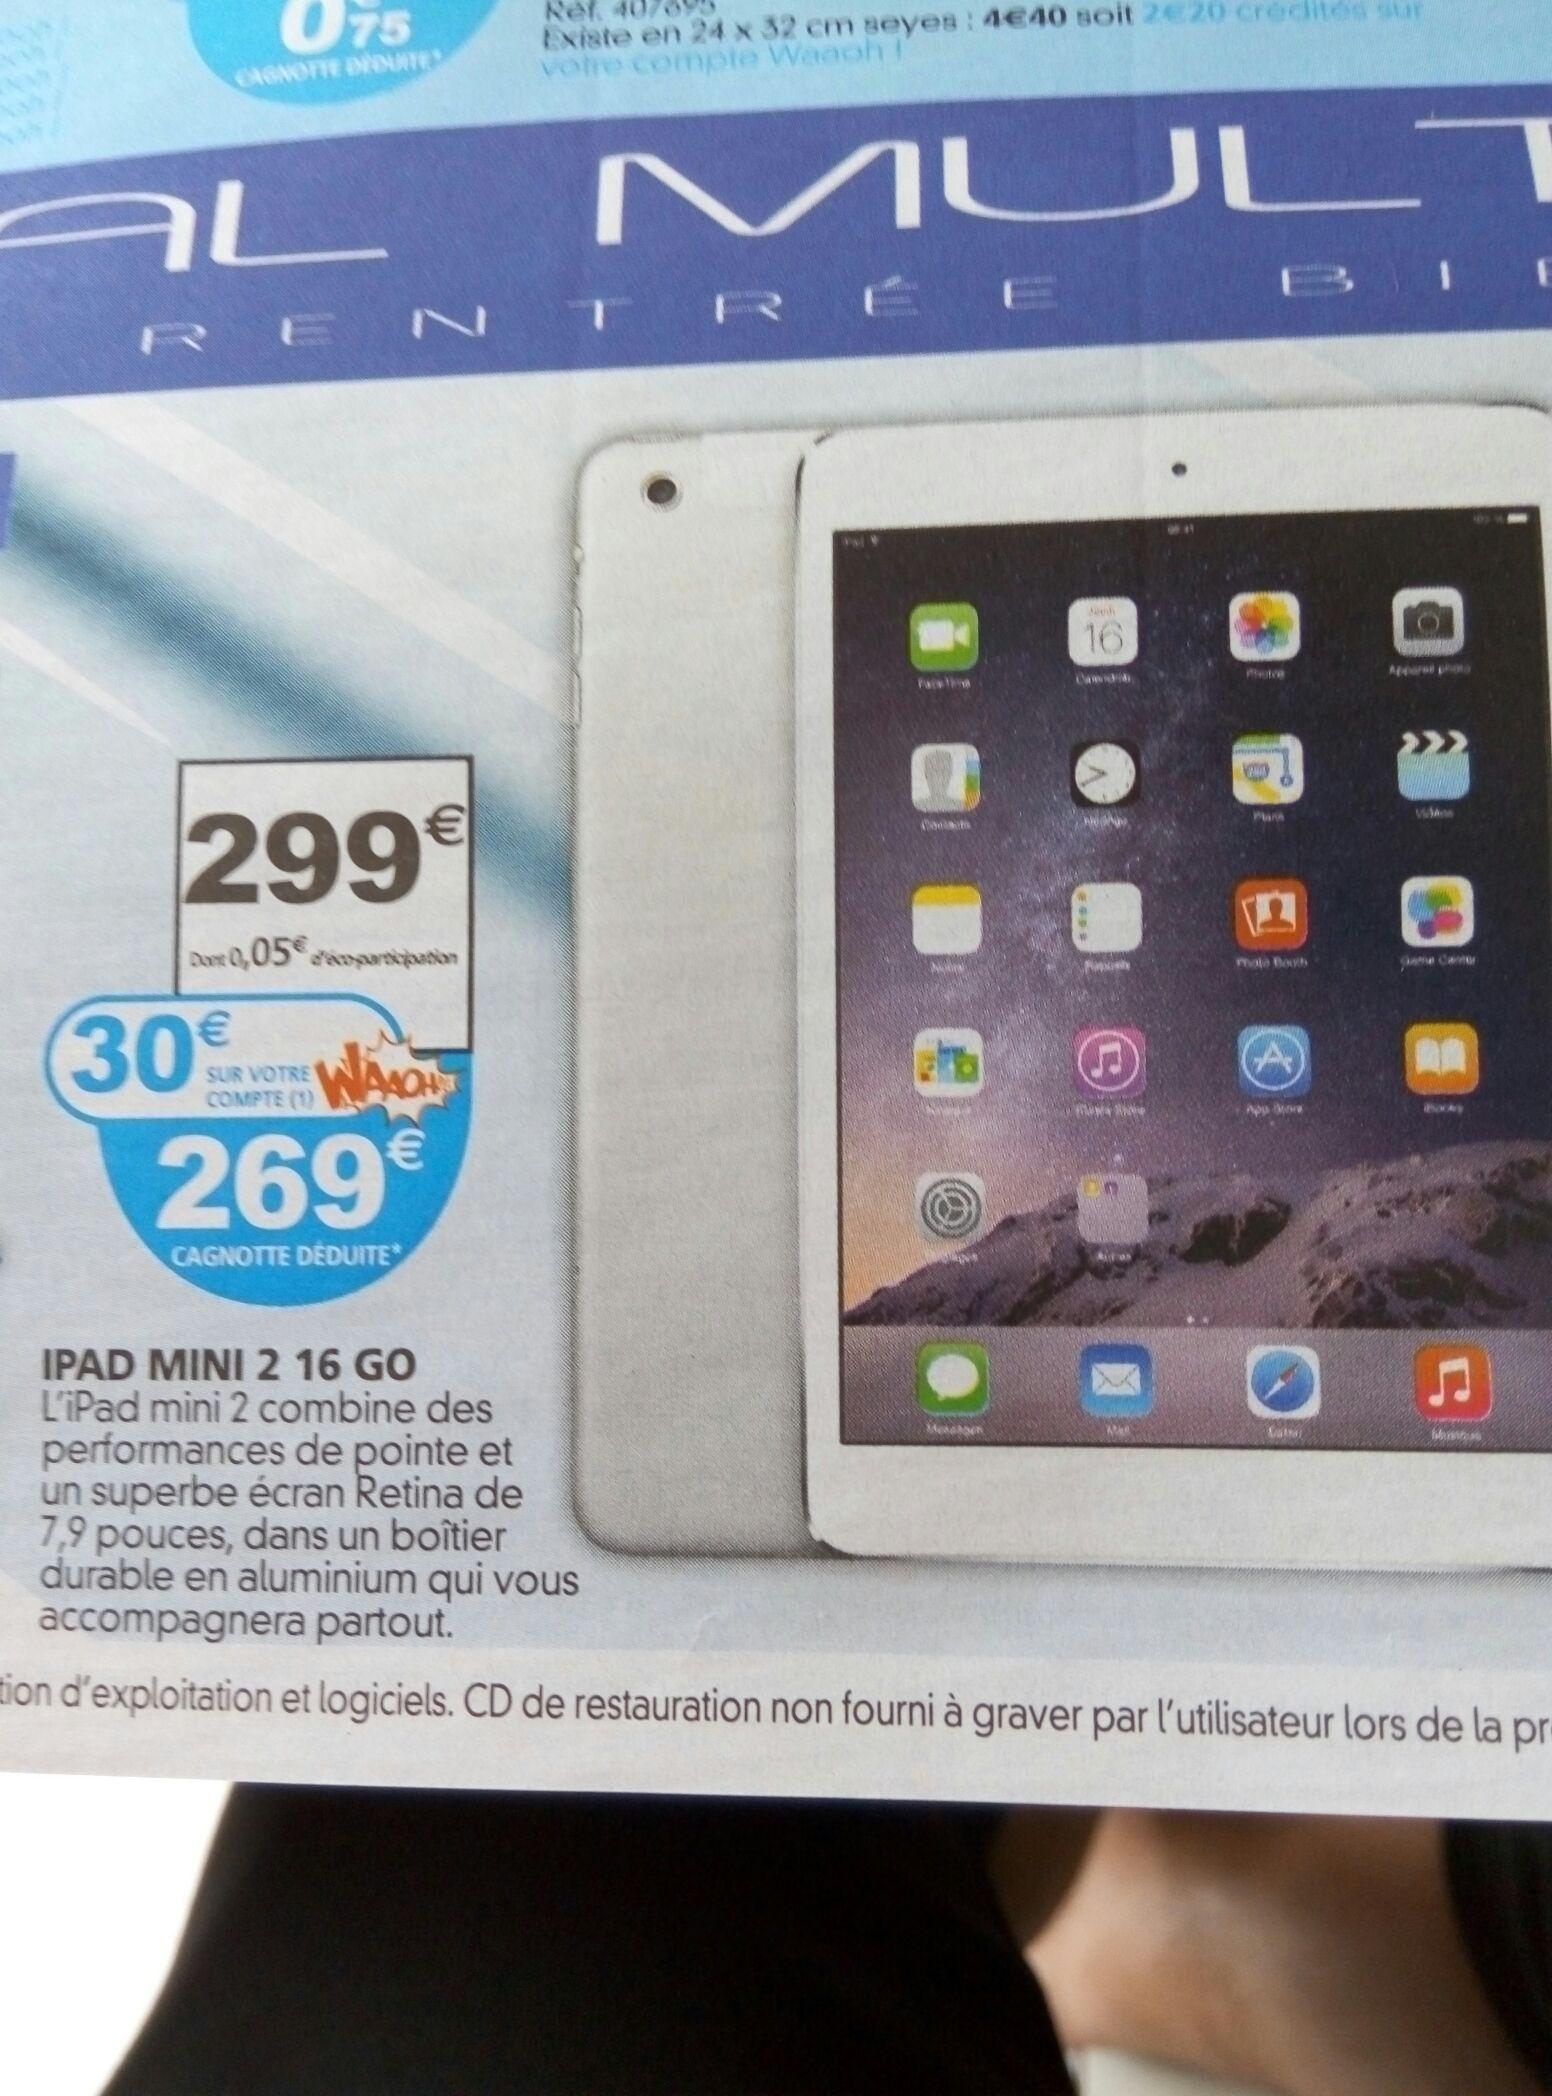 Tablette IPad mini 2 - 16 Go (via 30€ sur la carte Waaoh)